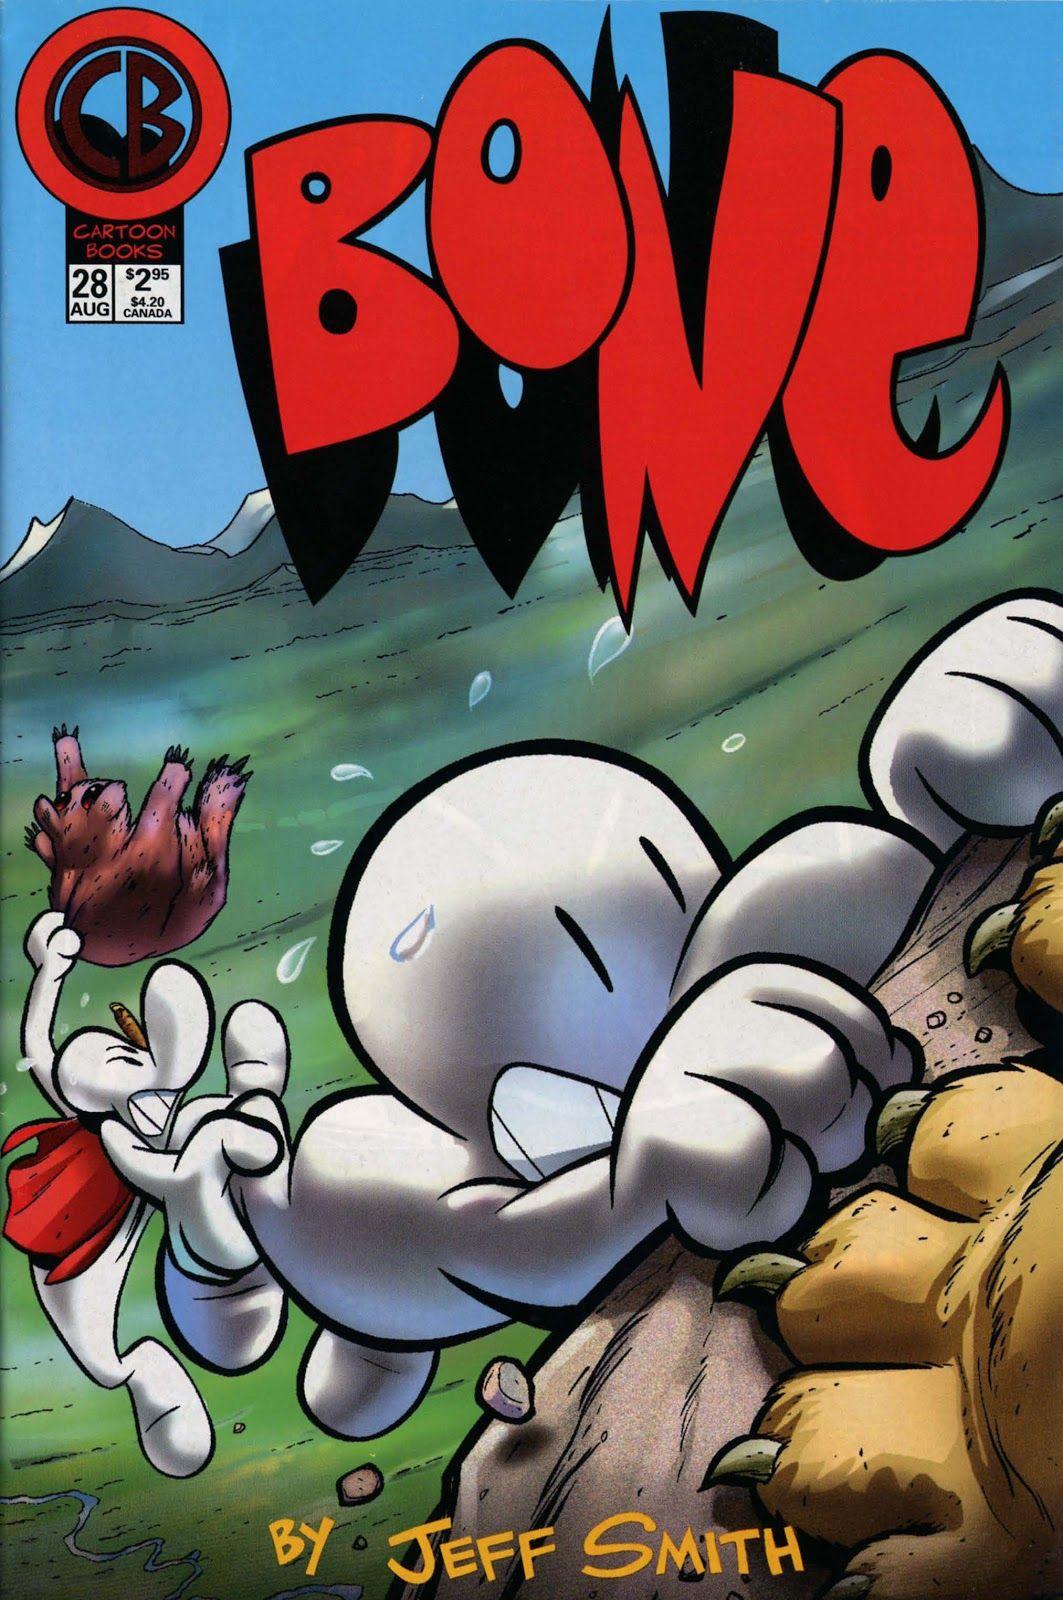 Bone 1991 Issue 28 Read Bone 1991 Issue 28 Comic Online In High Quality Bone Comic Jeff Smith Cartoon Books